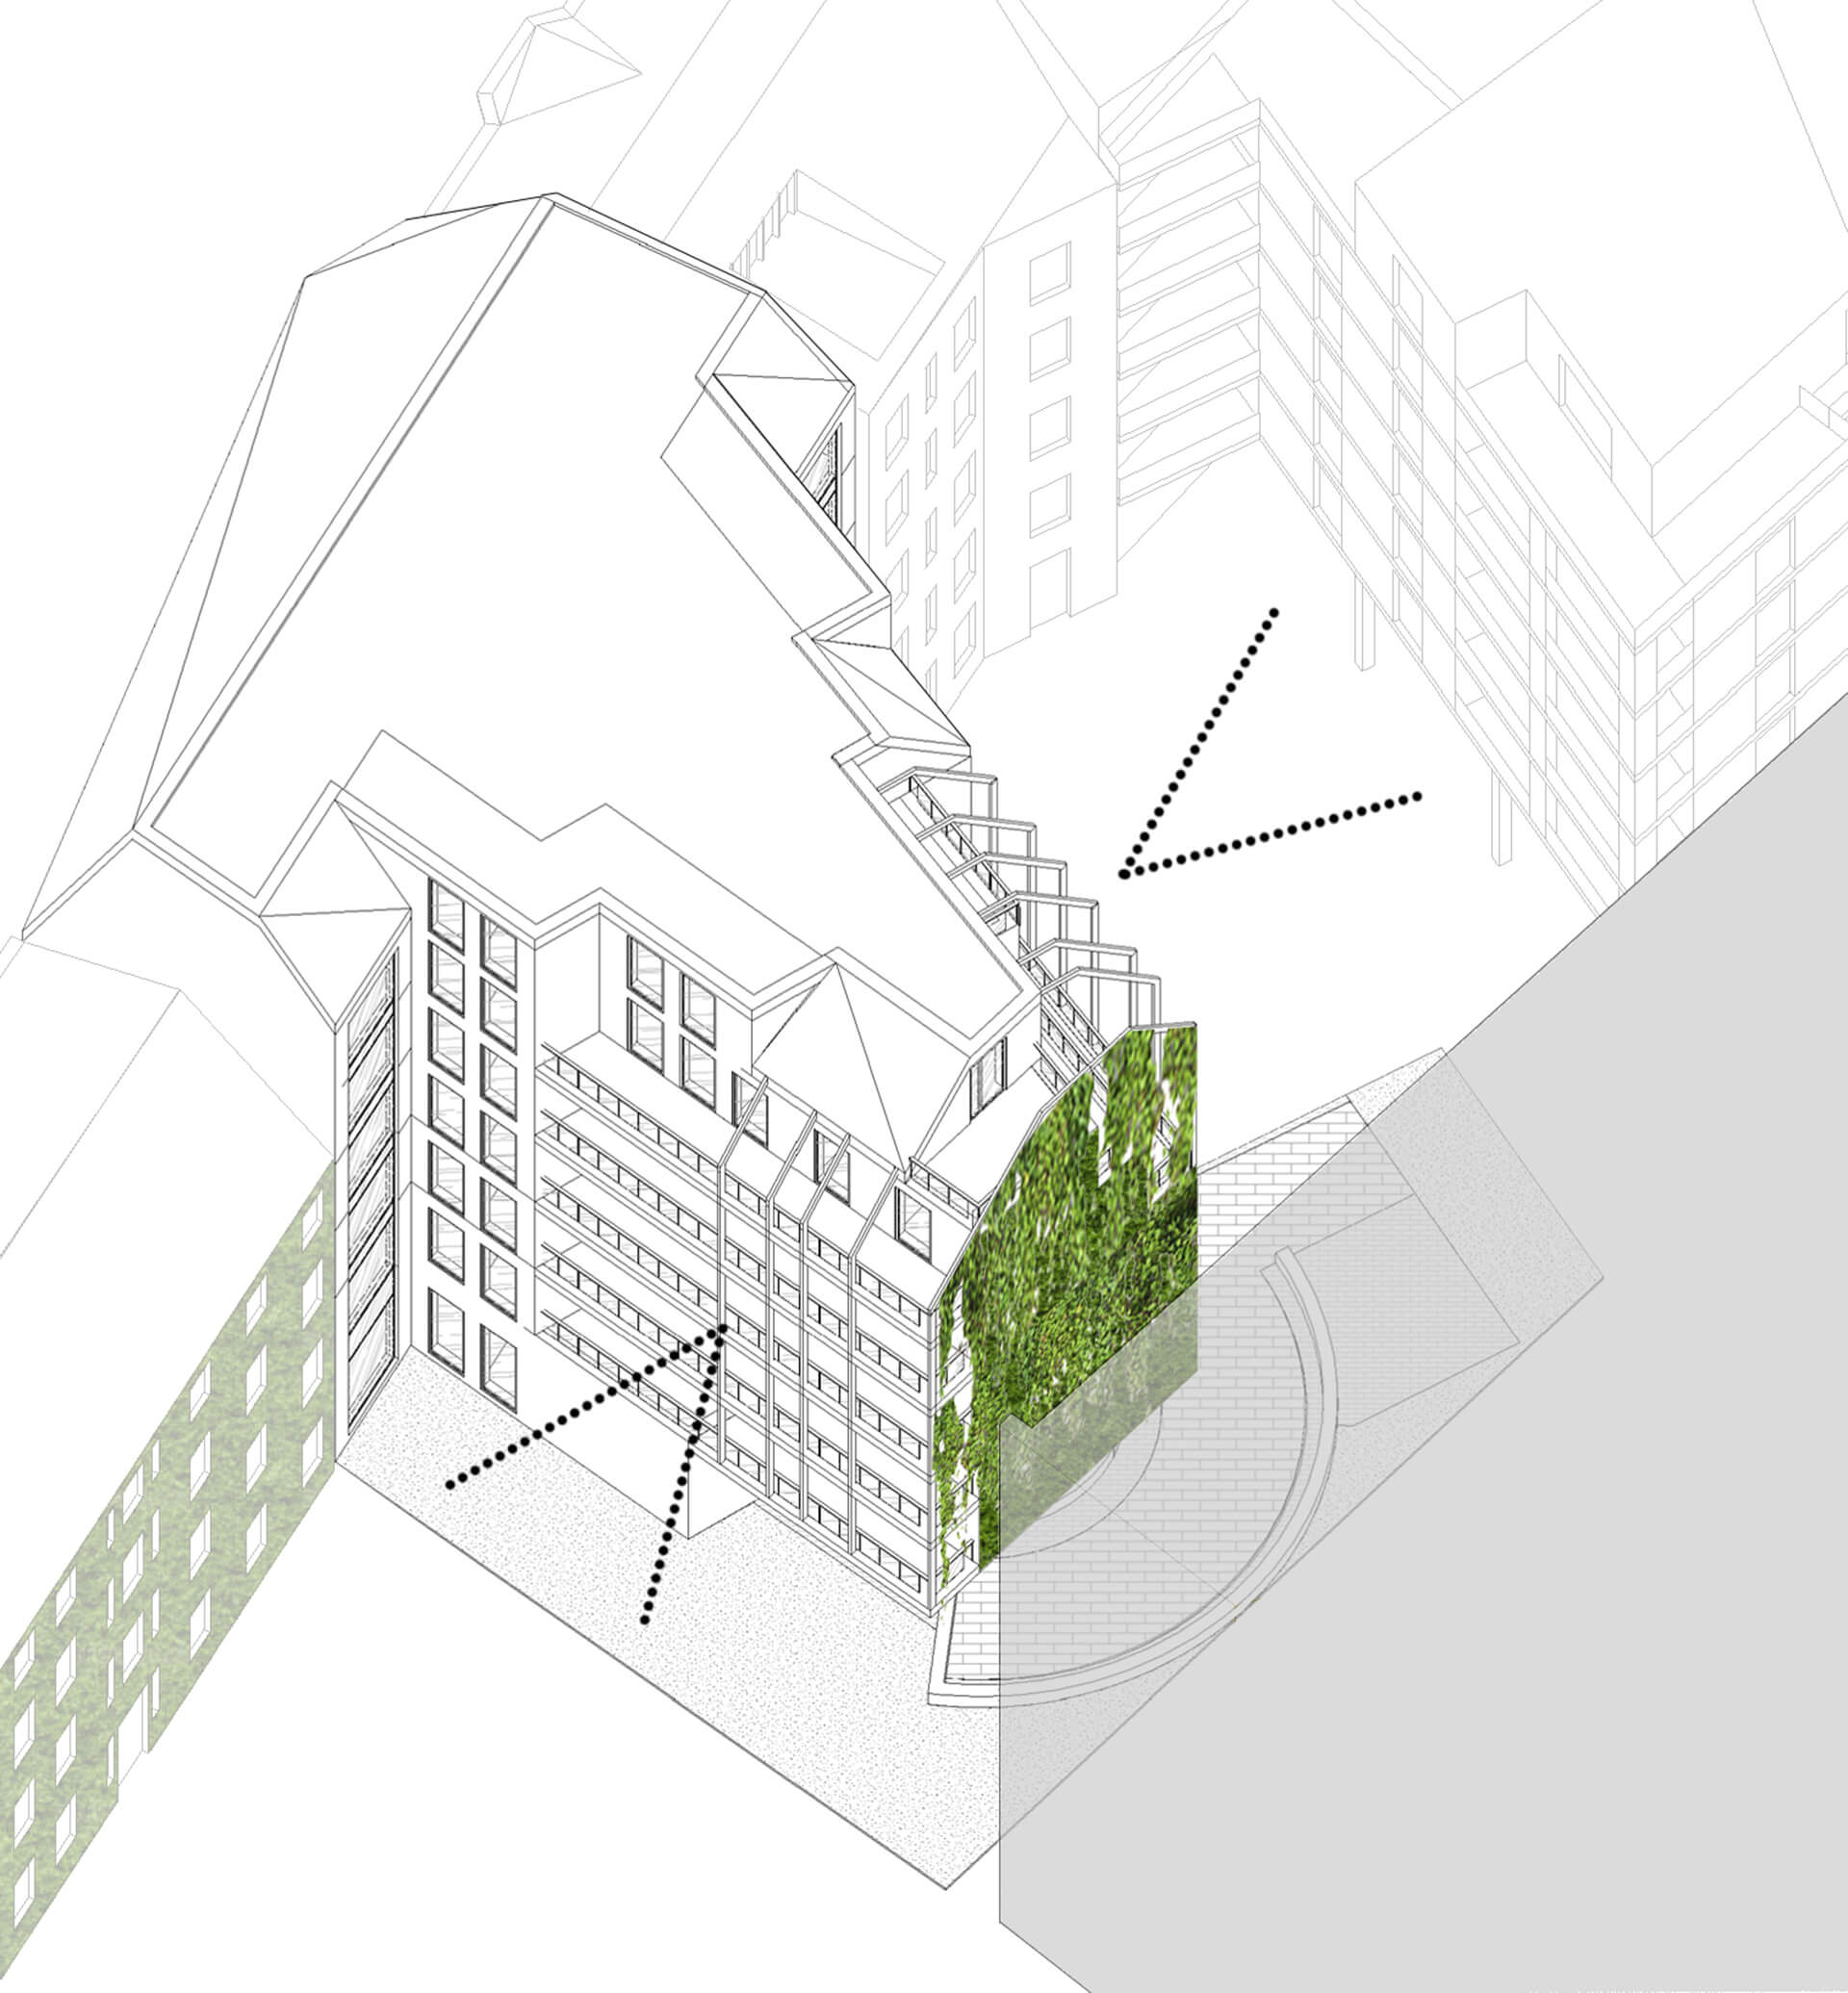 https://laagaarchitects.lv/wp-content/uploads/2019/11/03-02-5-KrB30.jpg